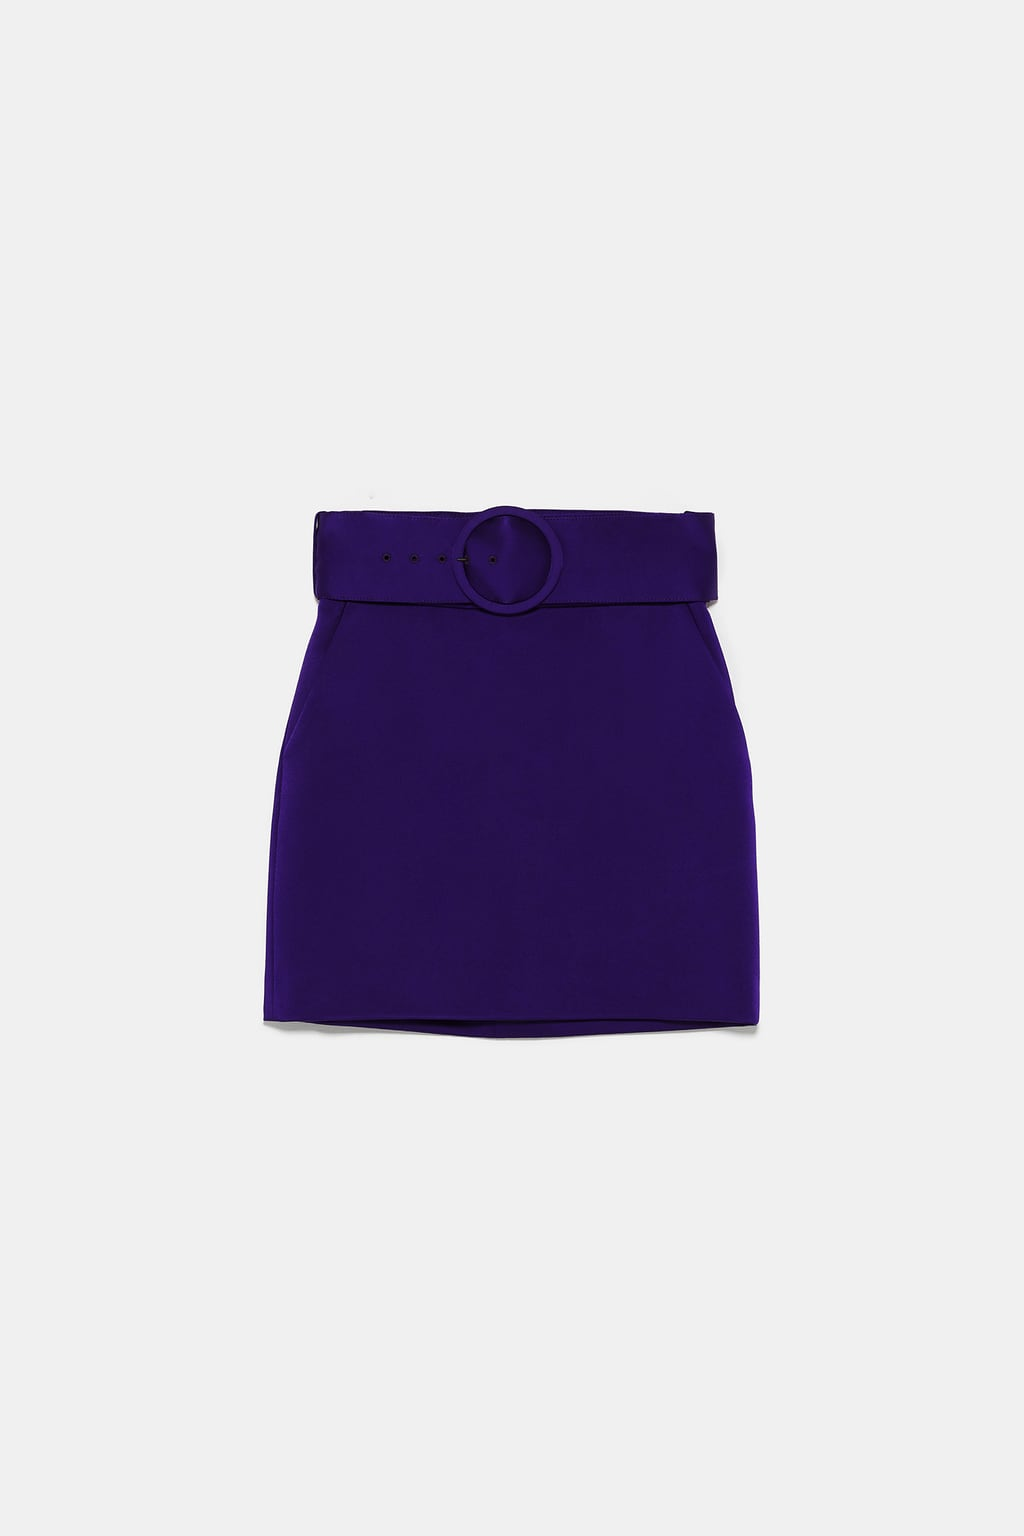 Saia Zara €49,95